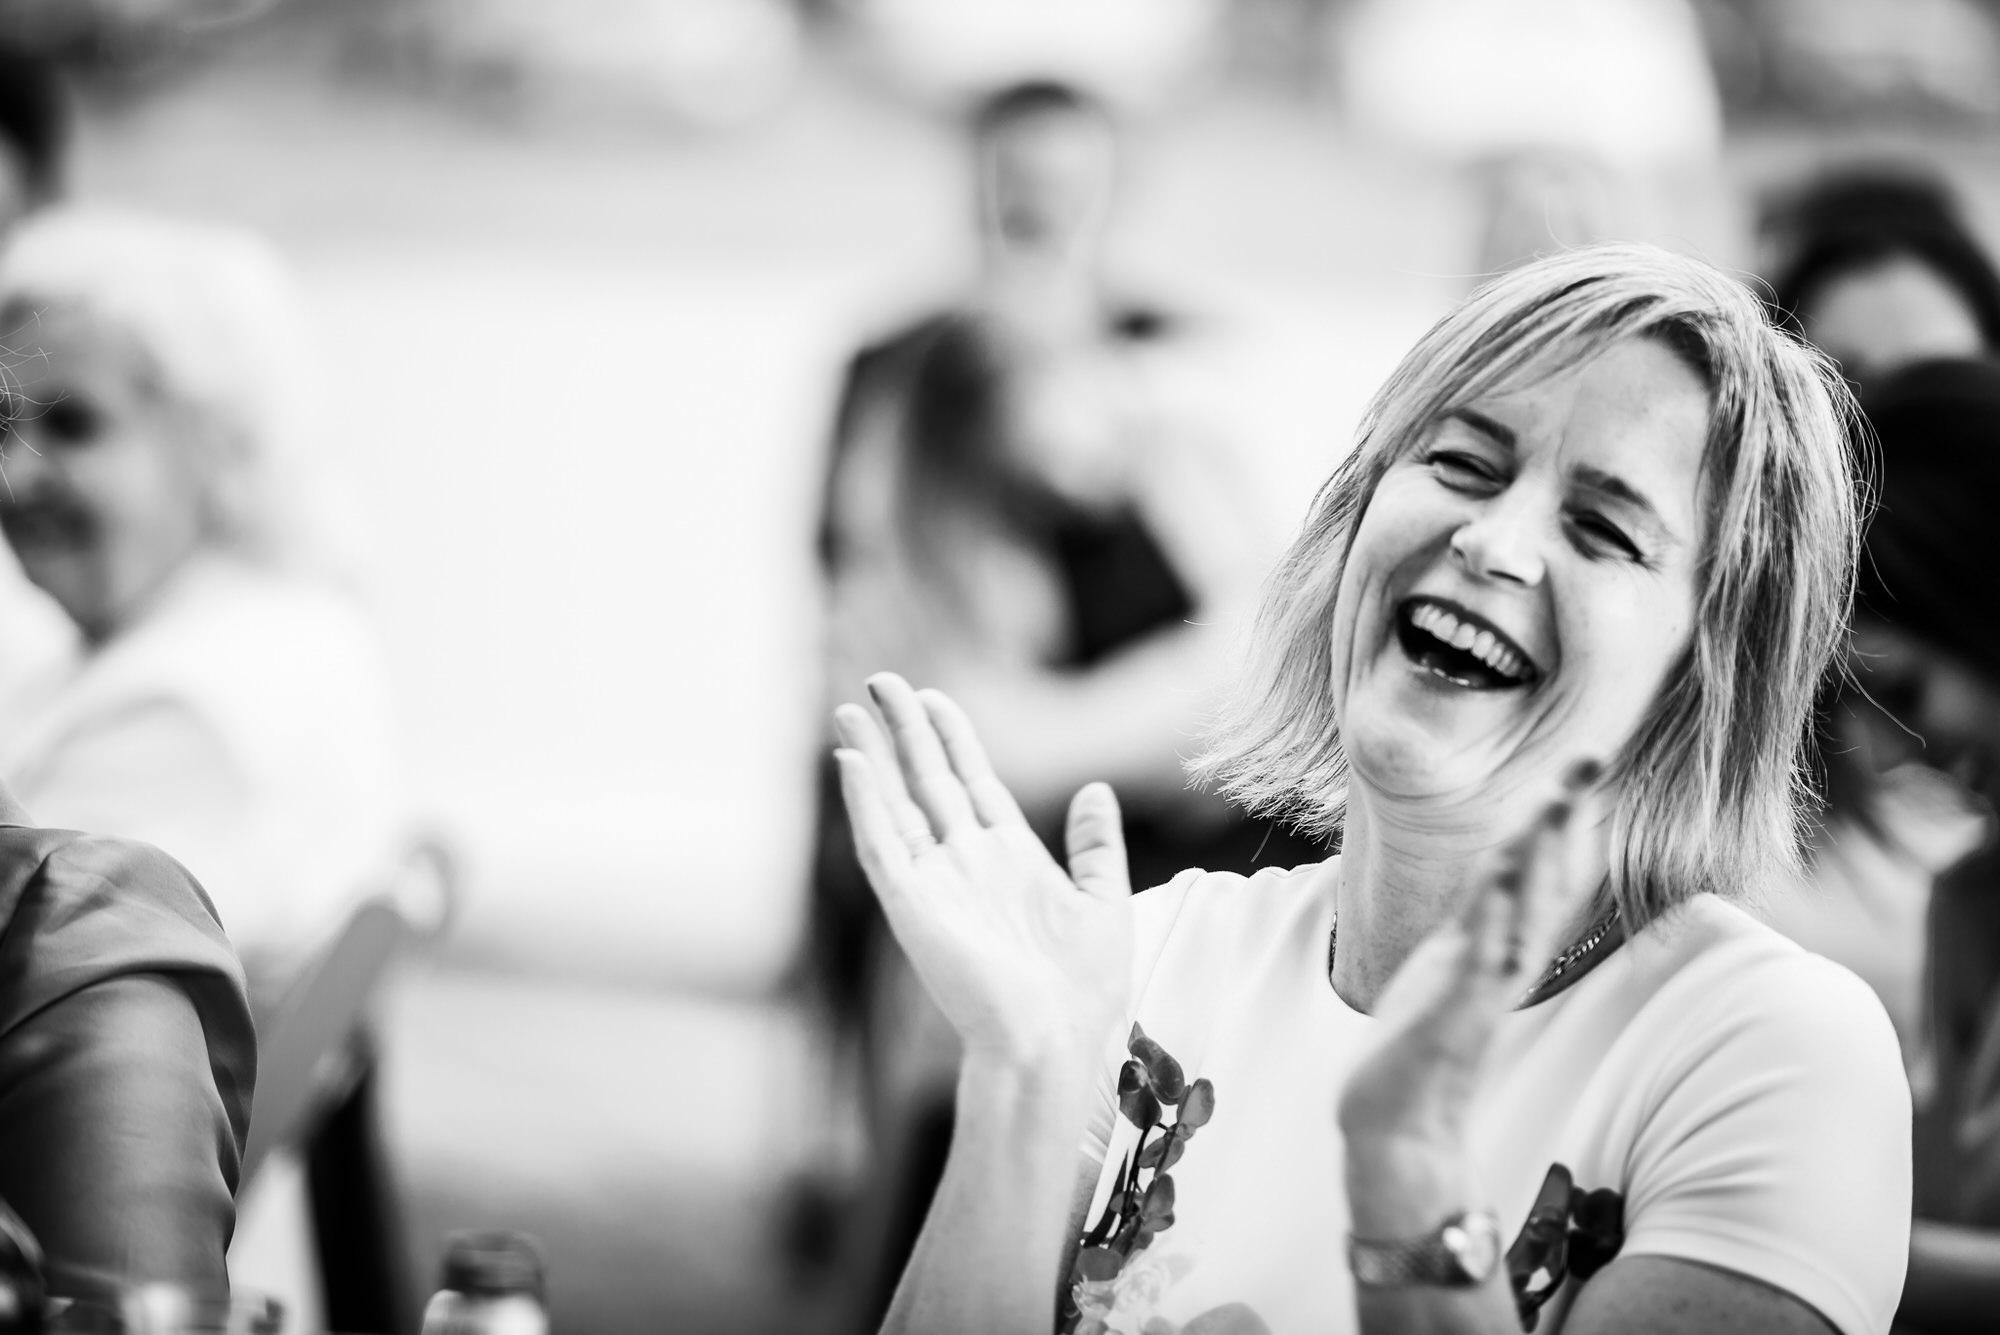 Best Of Yorkshire Wedding Photography 2017 - Martyn Hand-58.jpg